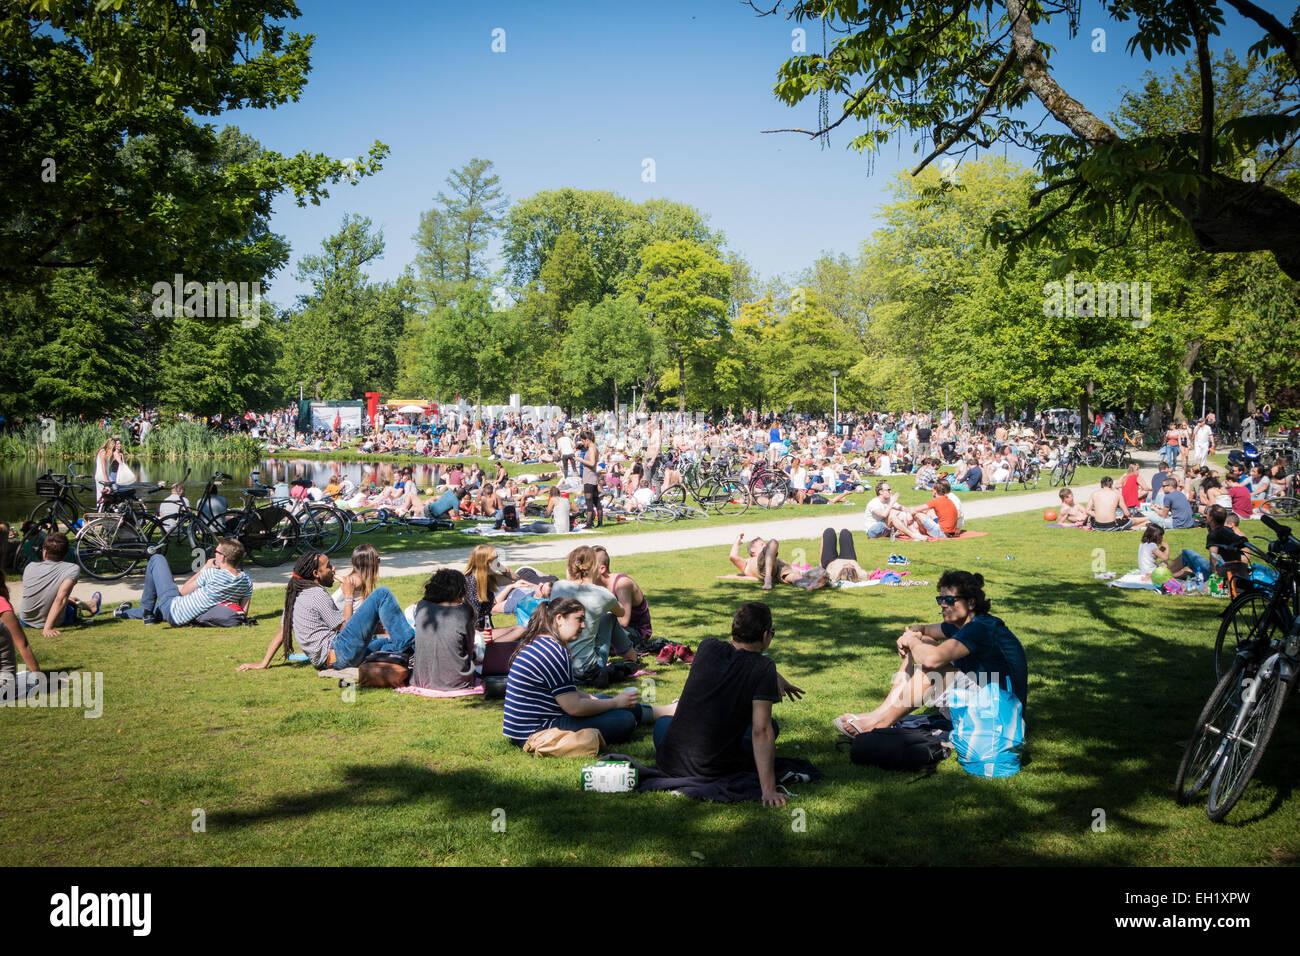 Crowds of people enjoying the sun in Vondelpark amsterdam - Stock Image